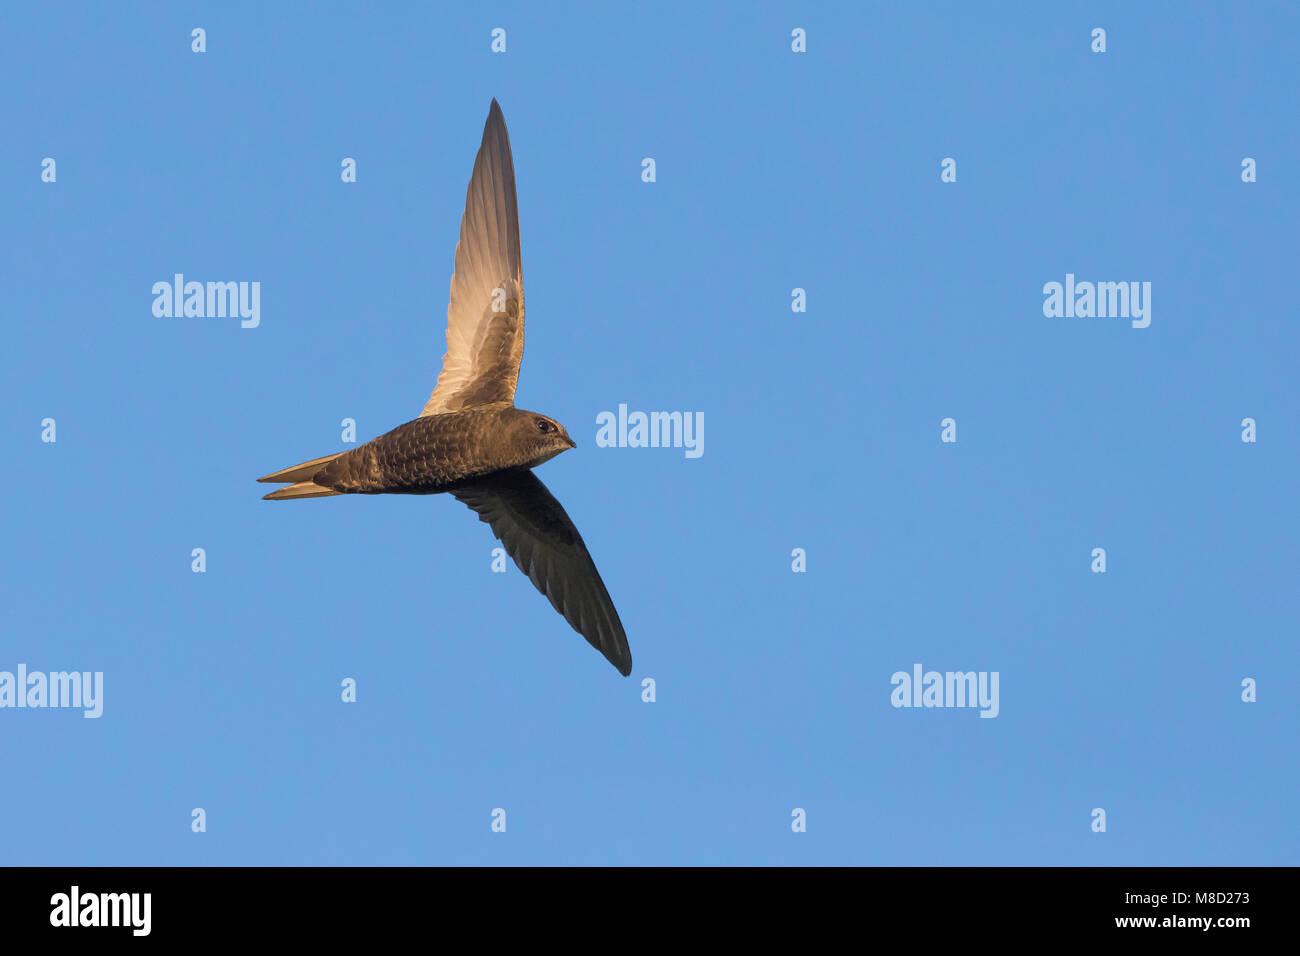 Gierzwaluw; Common Swift - Stock Image